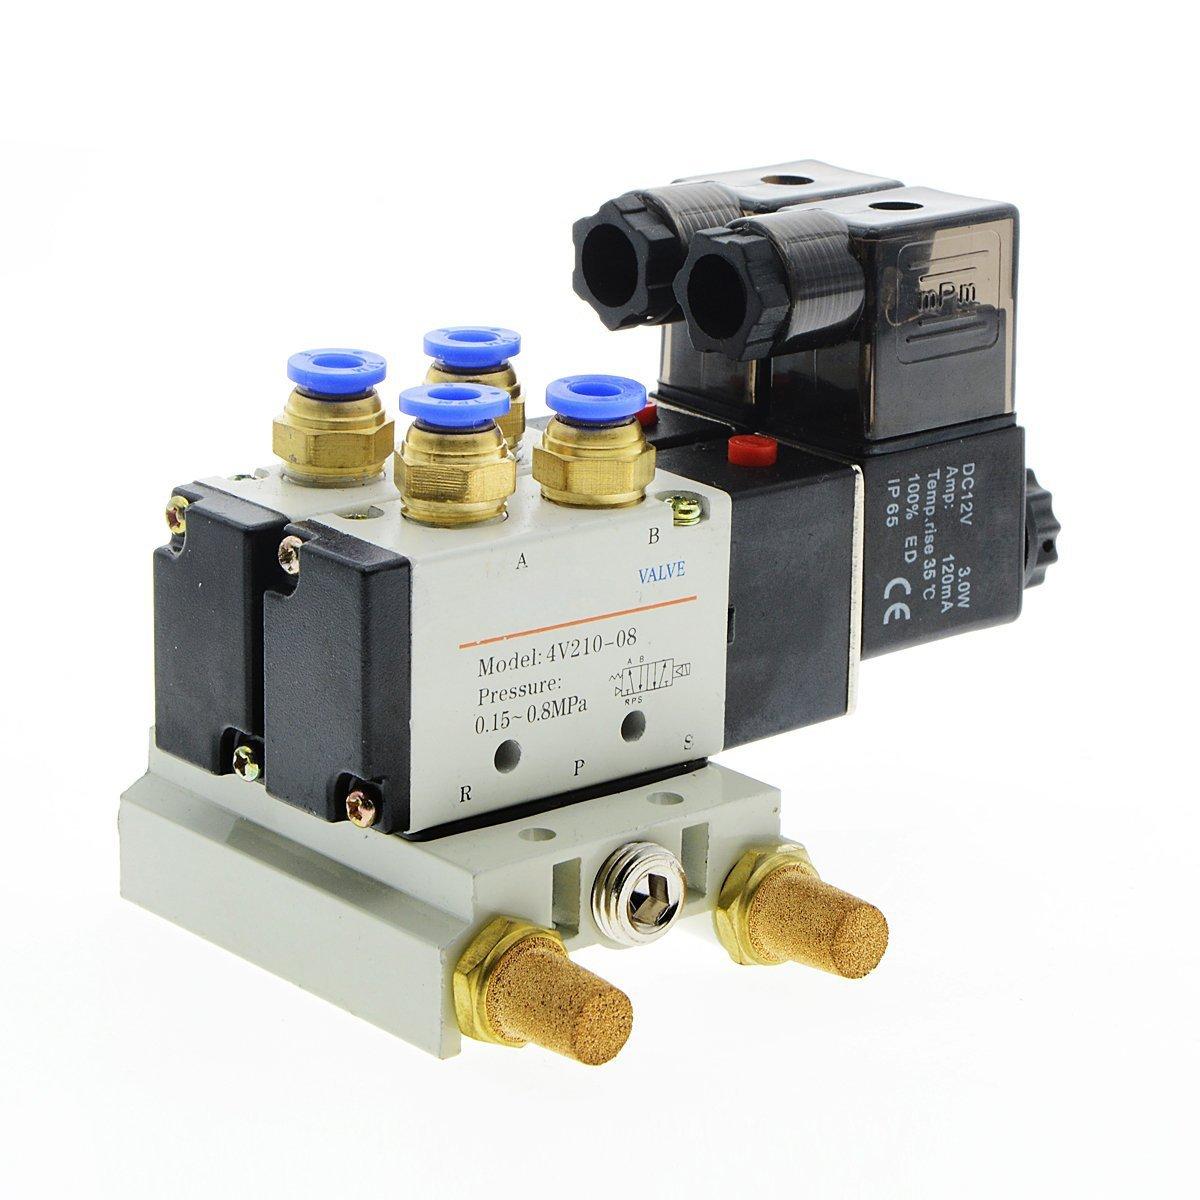 Saim 4V210-08 DC 12V Single Head 2 Position 5 Way Pneumatic Solenoid Valve Base Muffler Quick Fittings Set LS000003